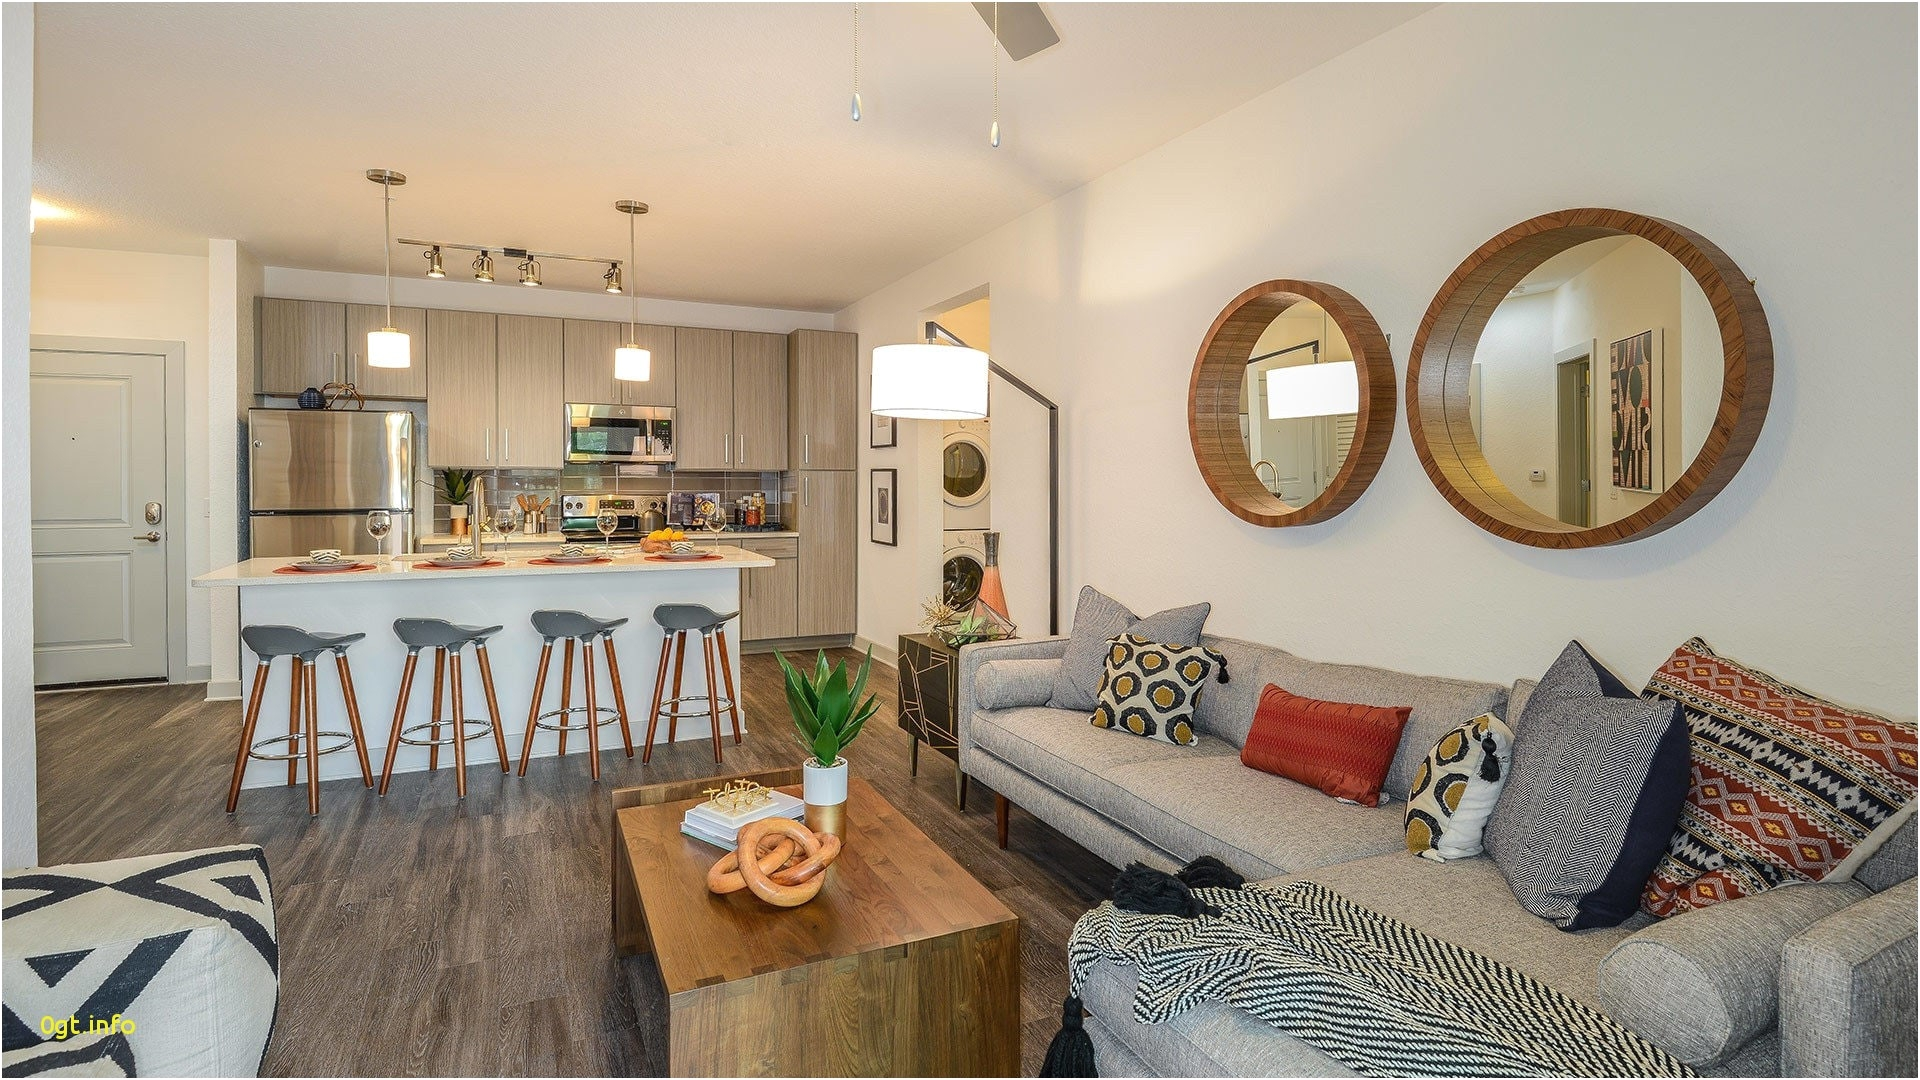 rent furniture tampa fl home interior designer today